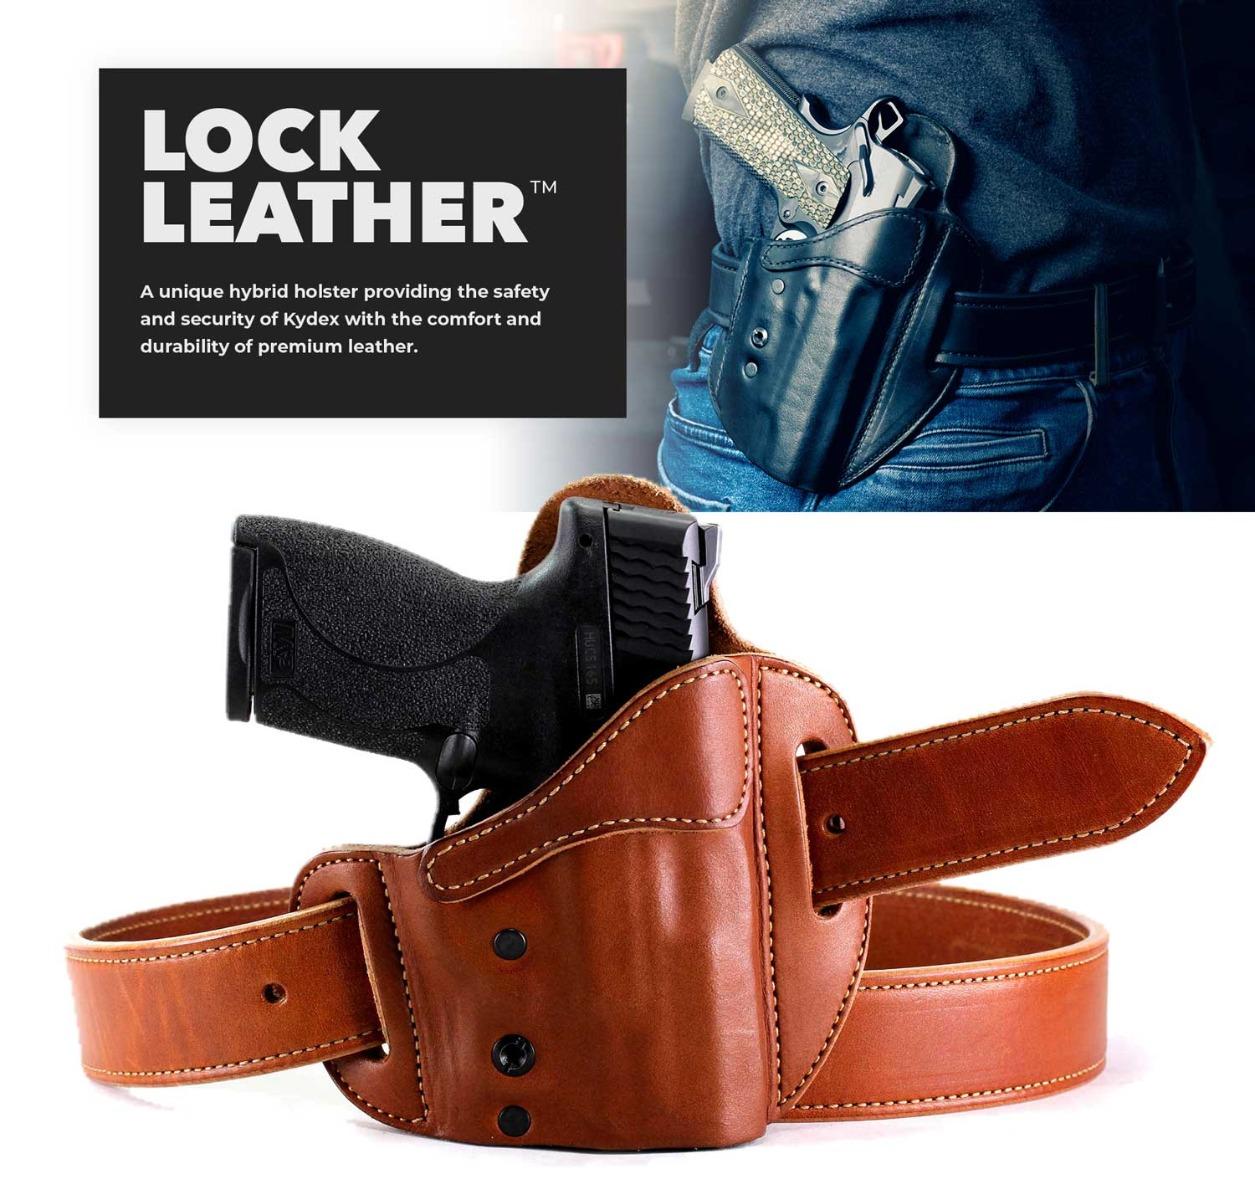 LockLeather